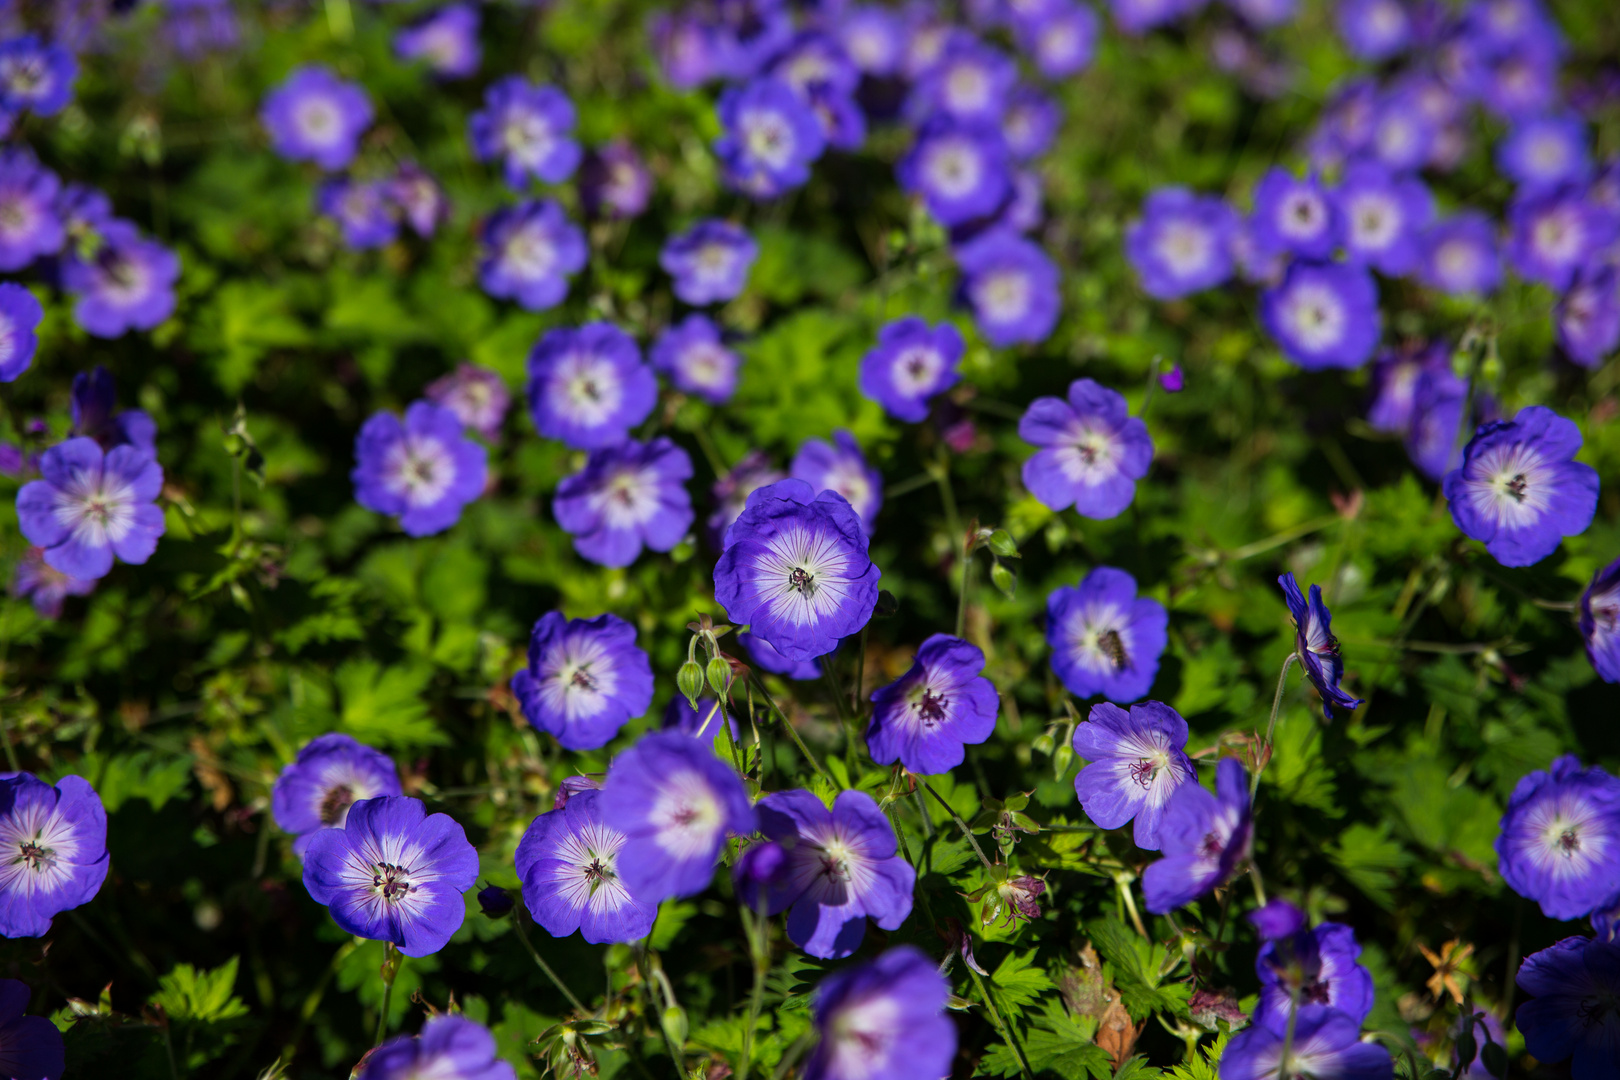 Friedhof voller Blumen